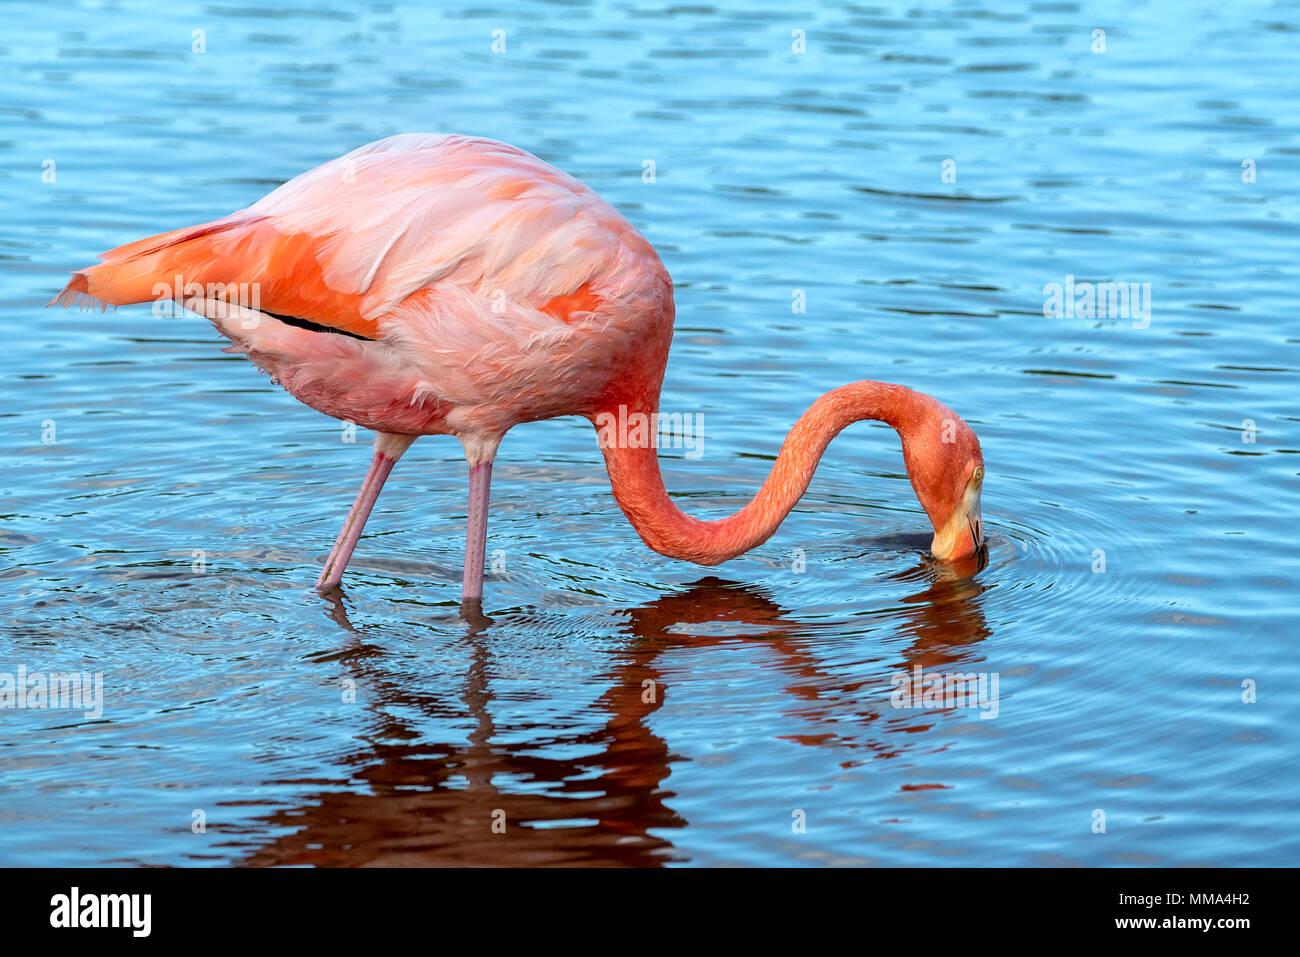 Flamingo (Phoenicopterus ruber) in a lagoon on Isabela Island, Galapagos Islands, Ecuador. - Stock Image